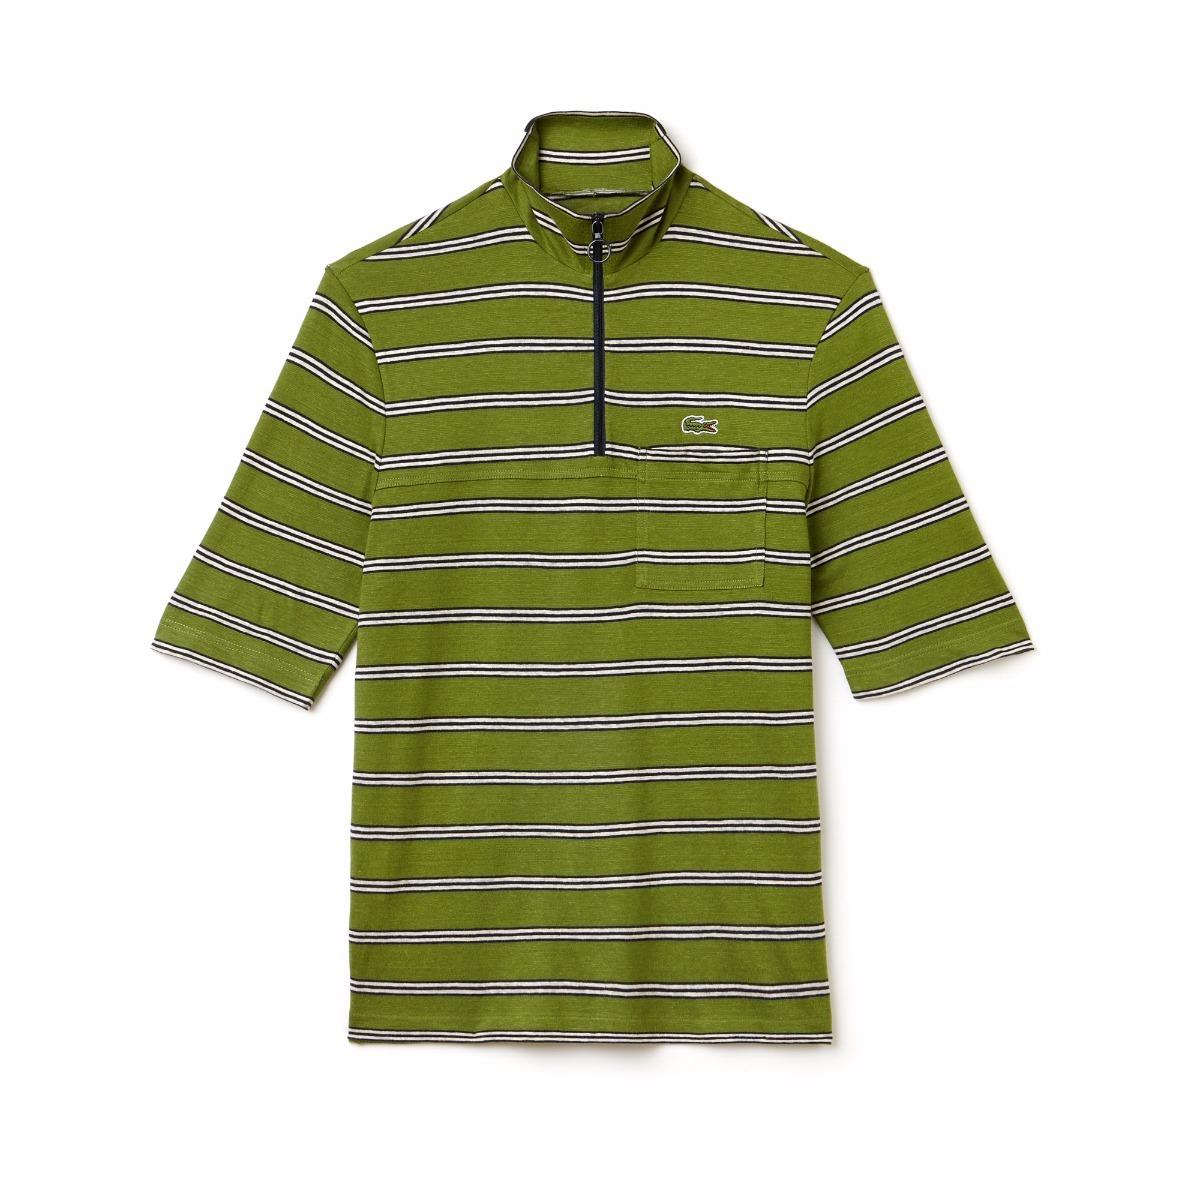 b89fd3f9dc652 camisa polo lacoste masculina com fecho de ziper slim fit. Carregando zoom.